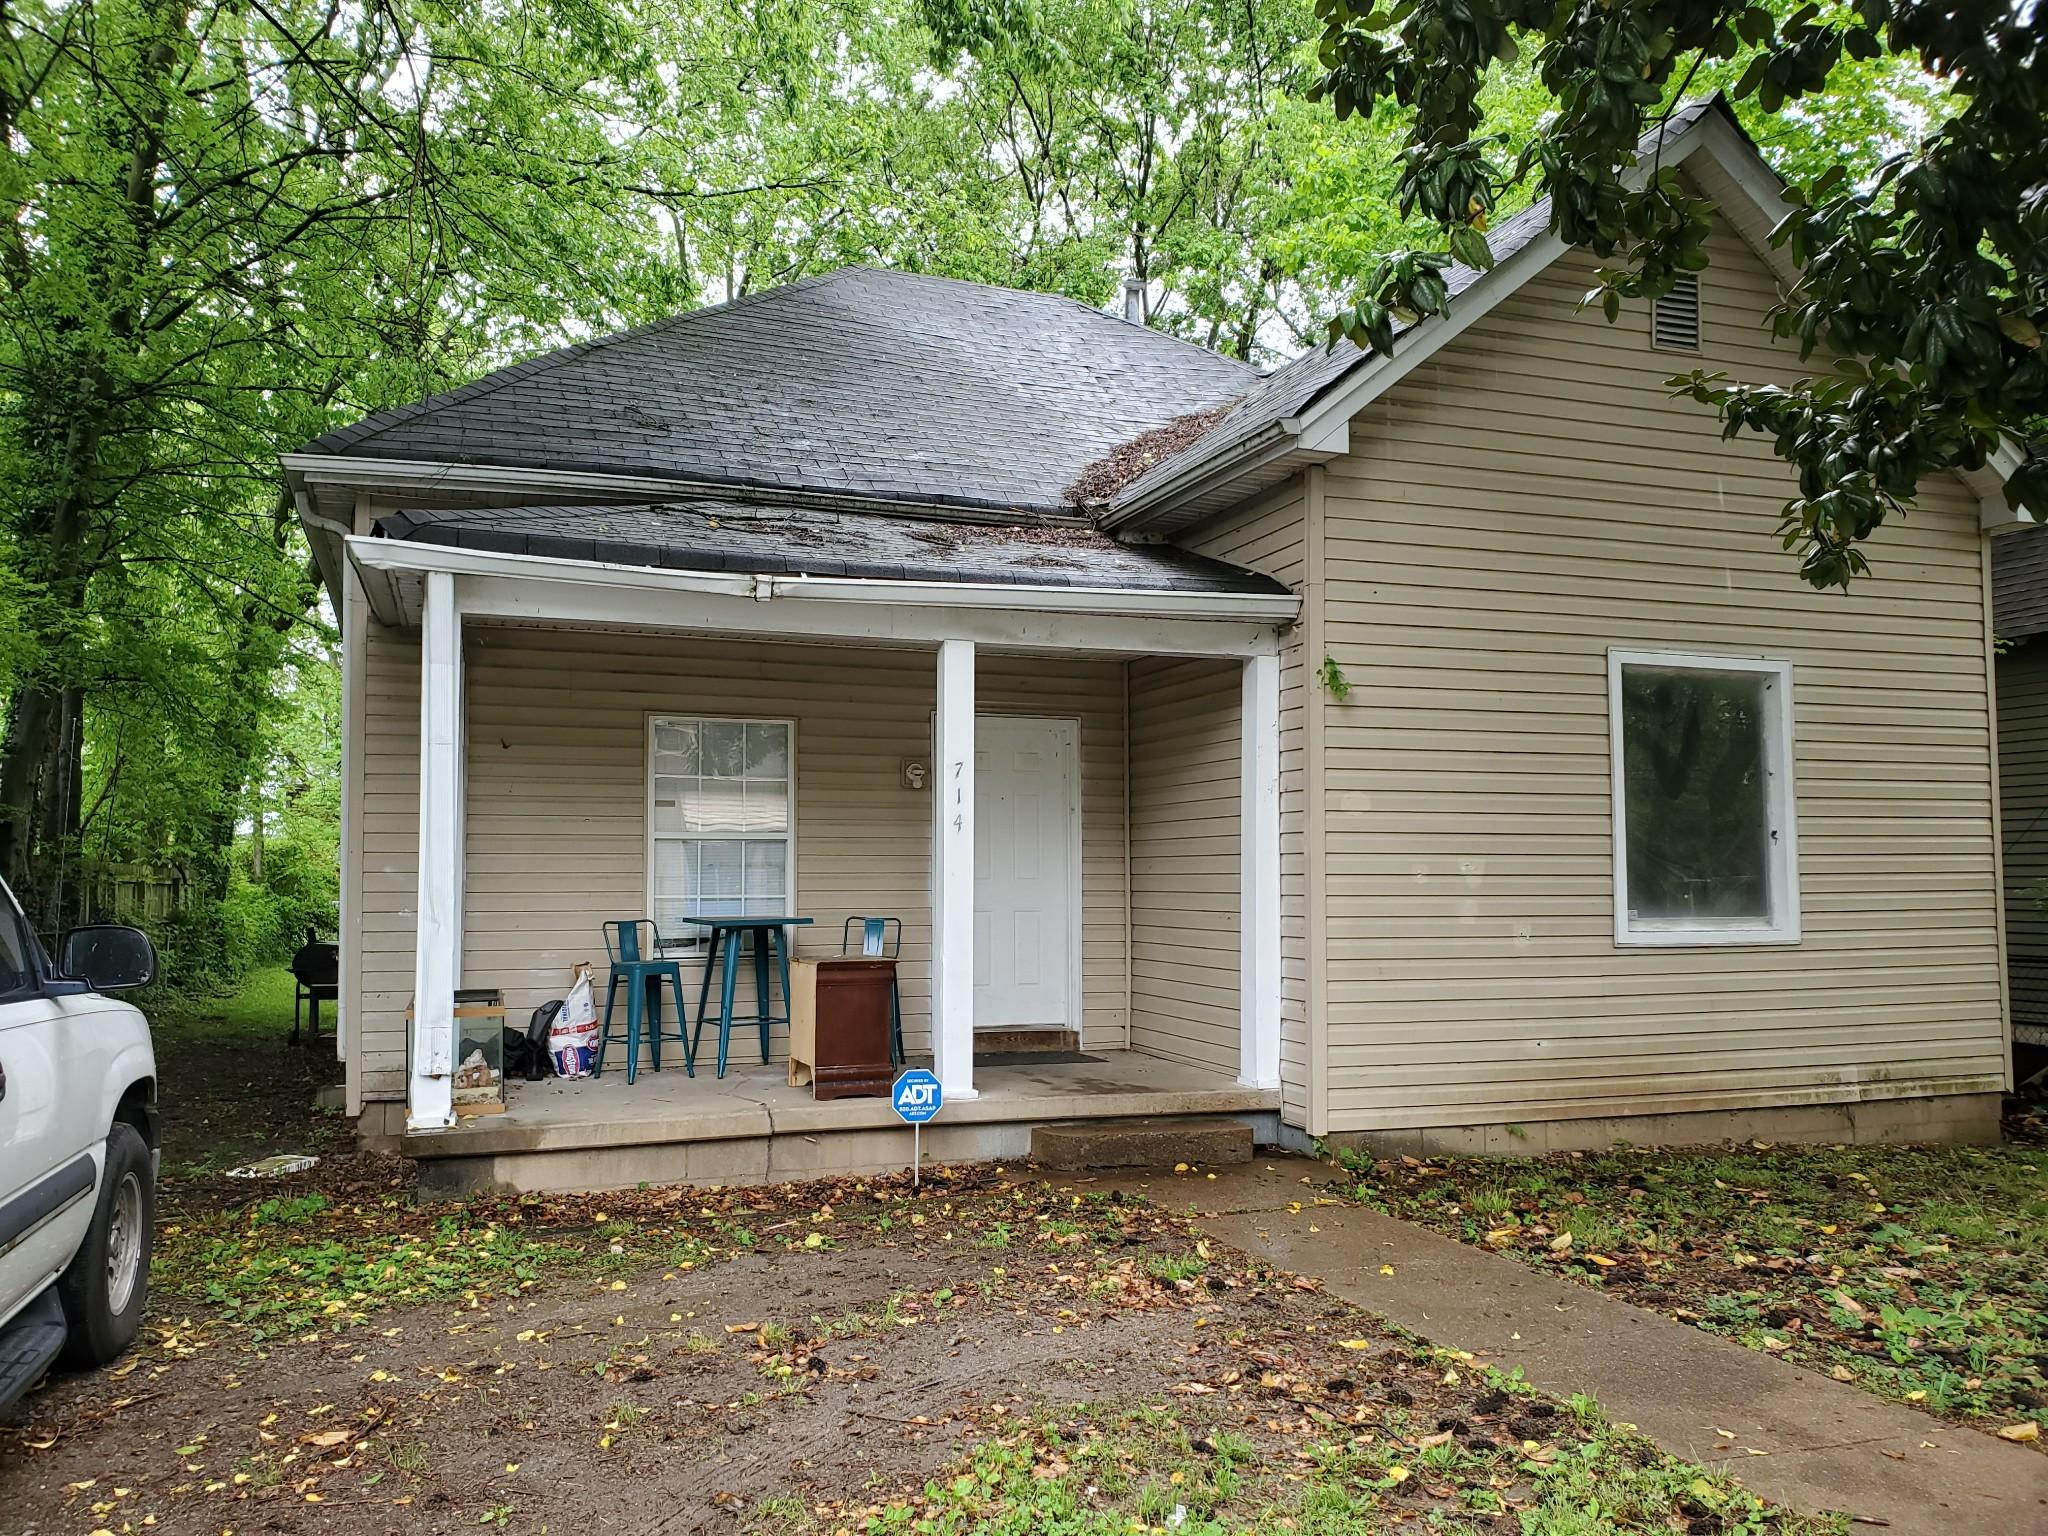 714 N 2nd St Property Photo - Nashville, TN real estate listing